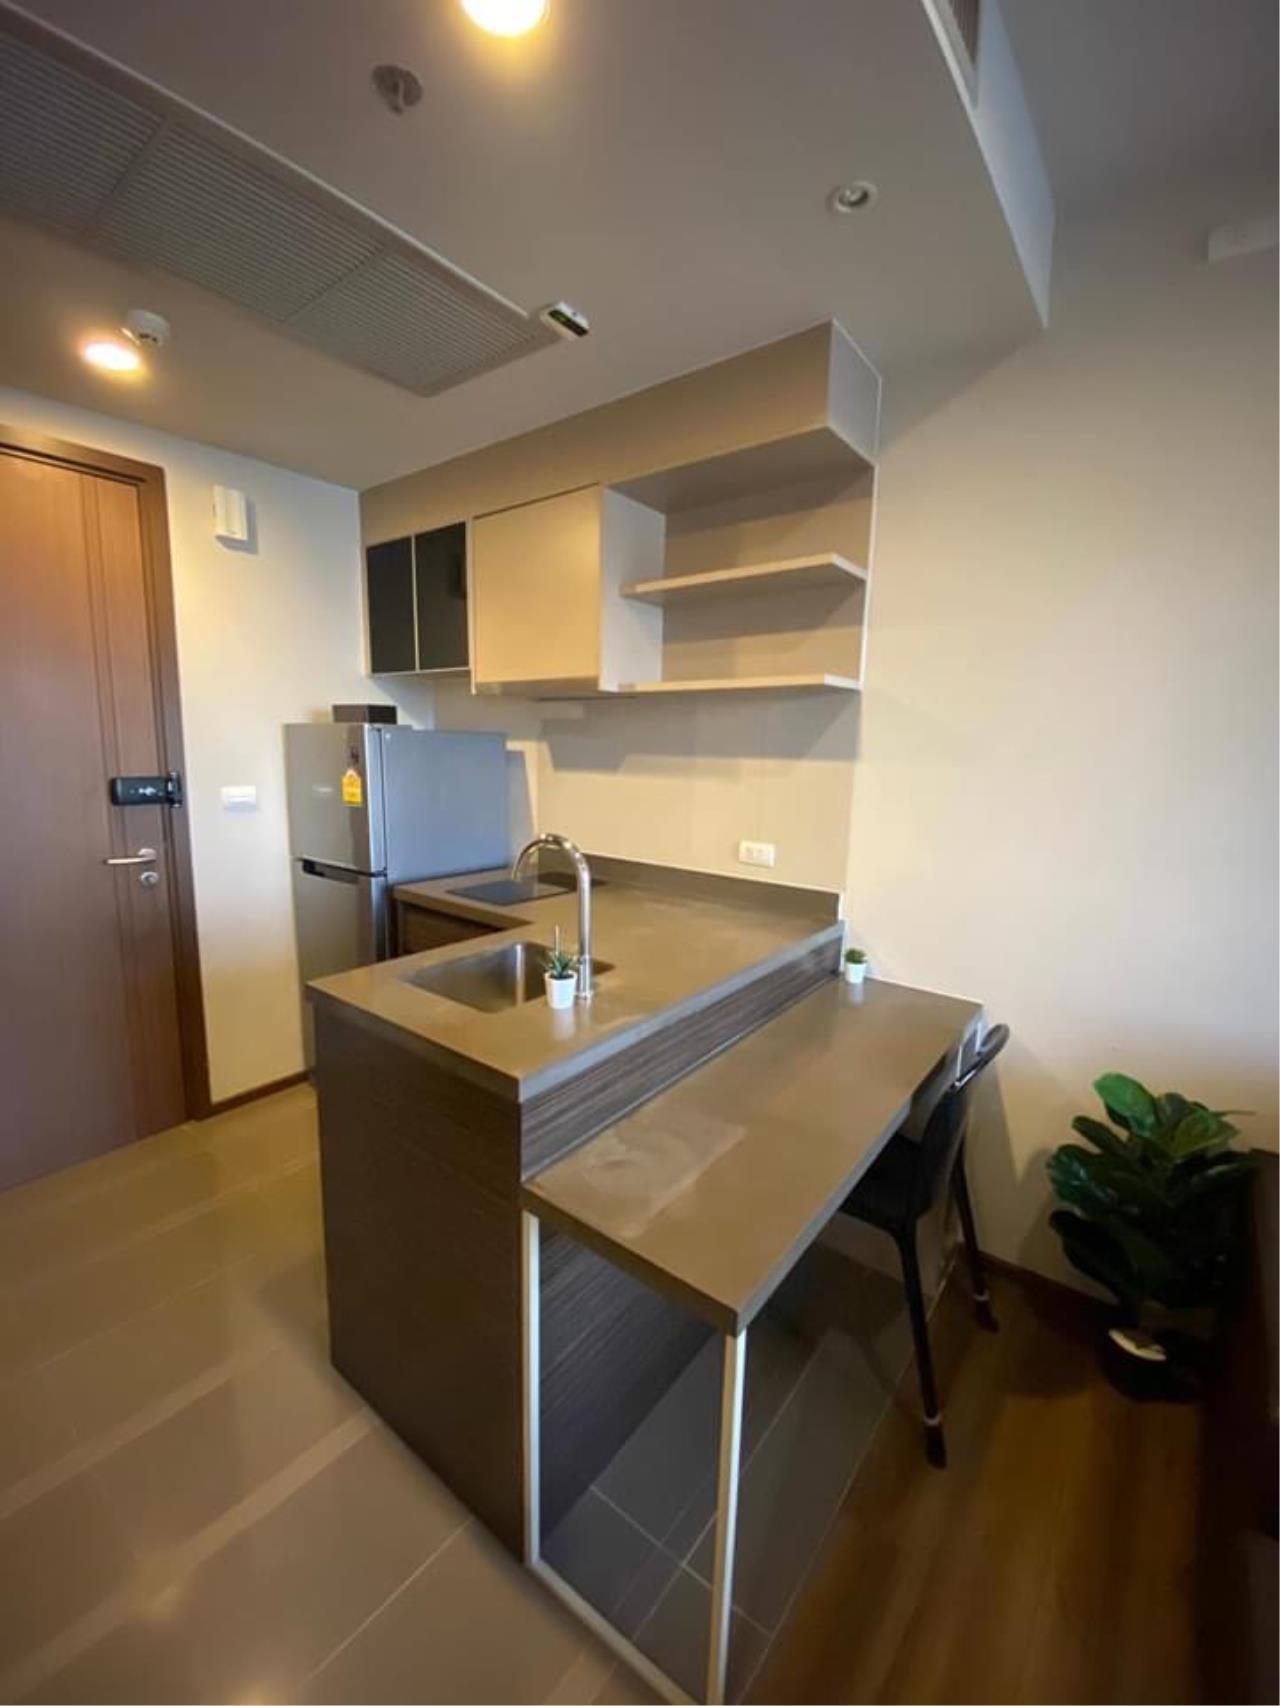 Agent - Phapayawarin Agency's Onyx Phaholyothin for Rent, 1 Bedroom 1 Bathroom, 31 Sq.m., BTS Saphan Khwai 7